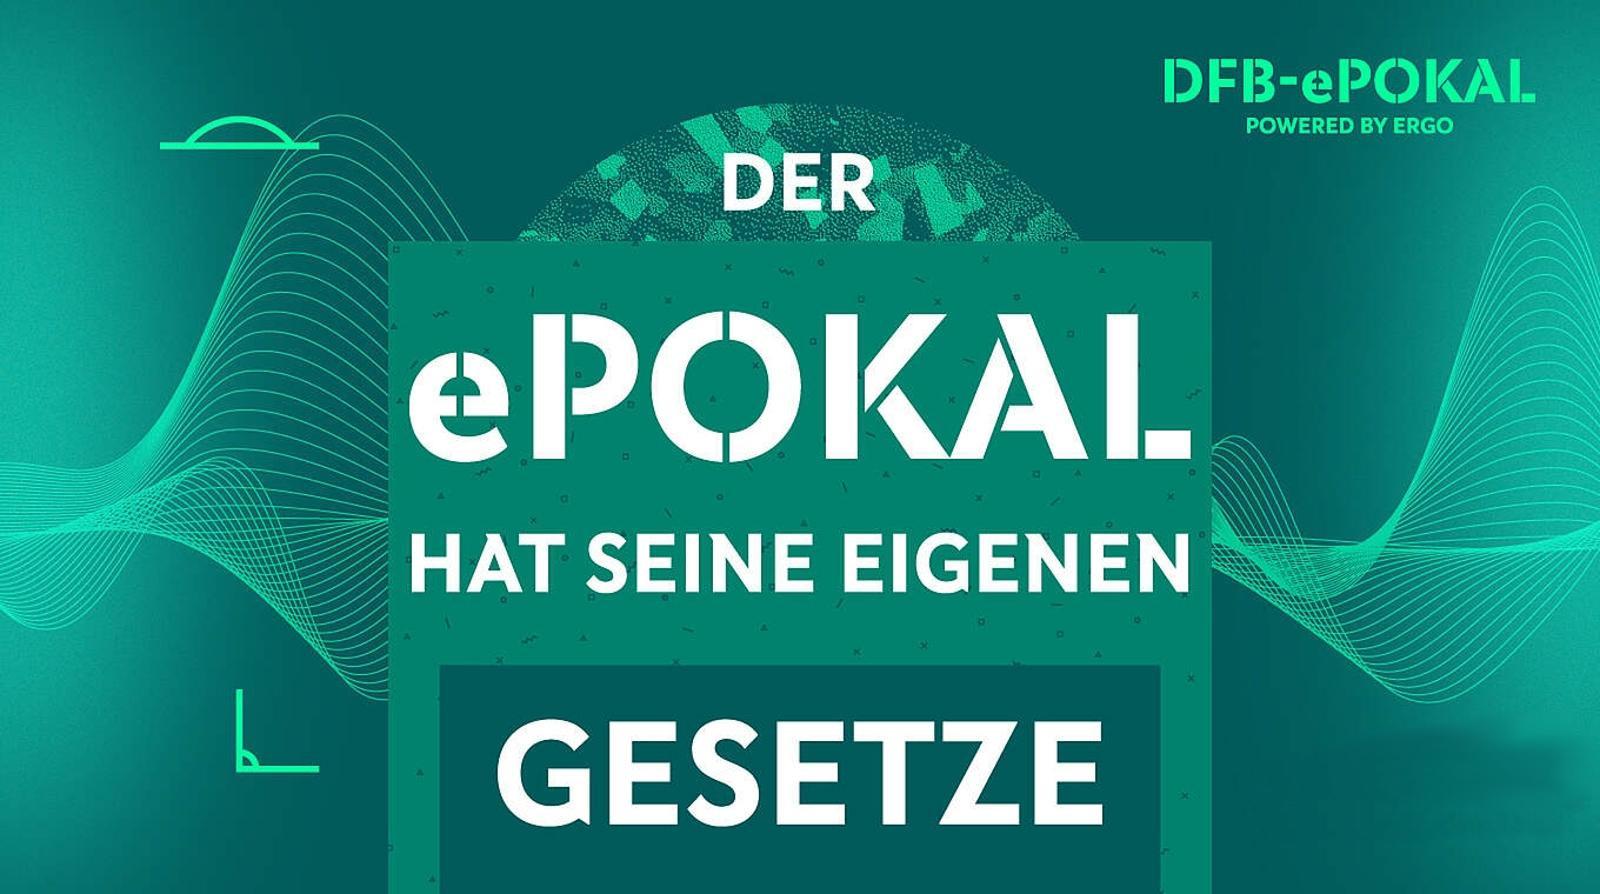 1. CfR ist Teilnehmer beim DFB ePokal